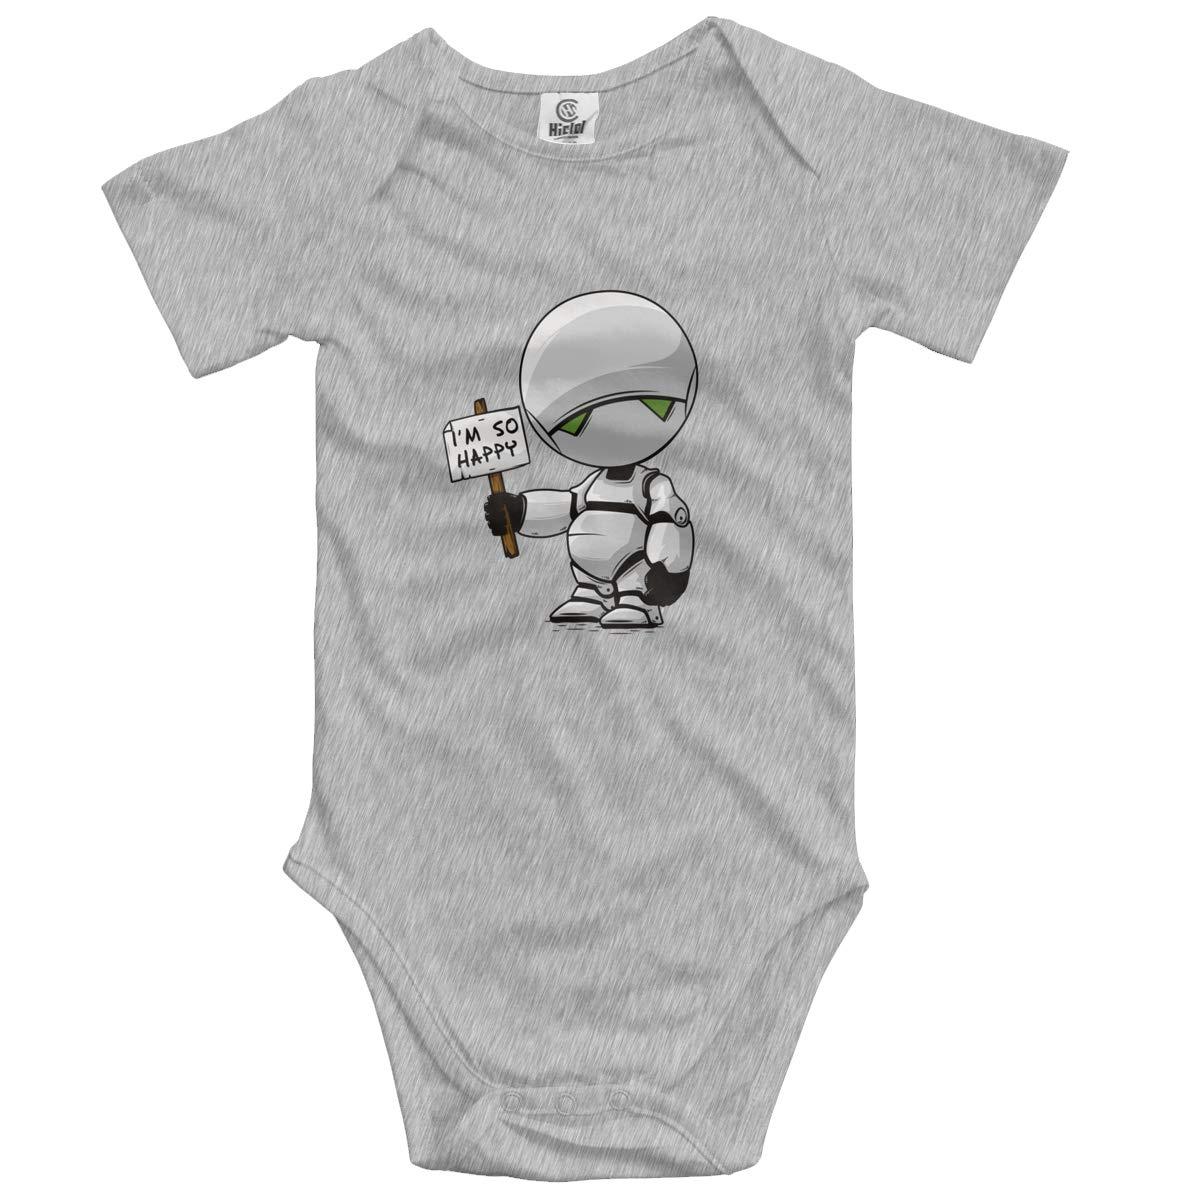 Im So Happy Baby Romper 0-18 Months Newborn Baby Girls Boys Layette Rompers Black